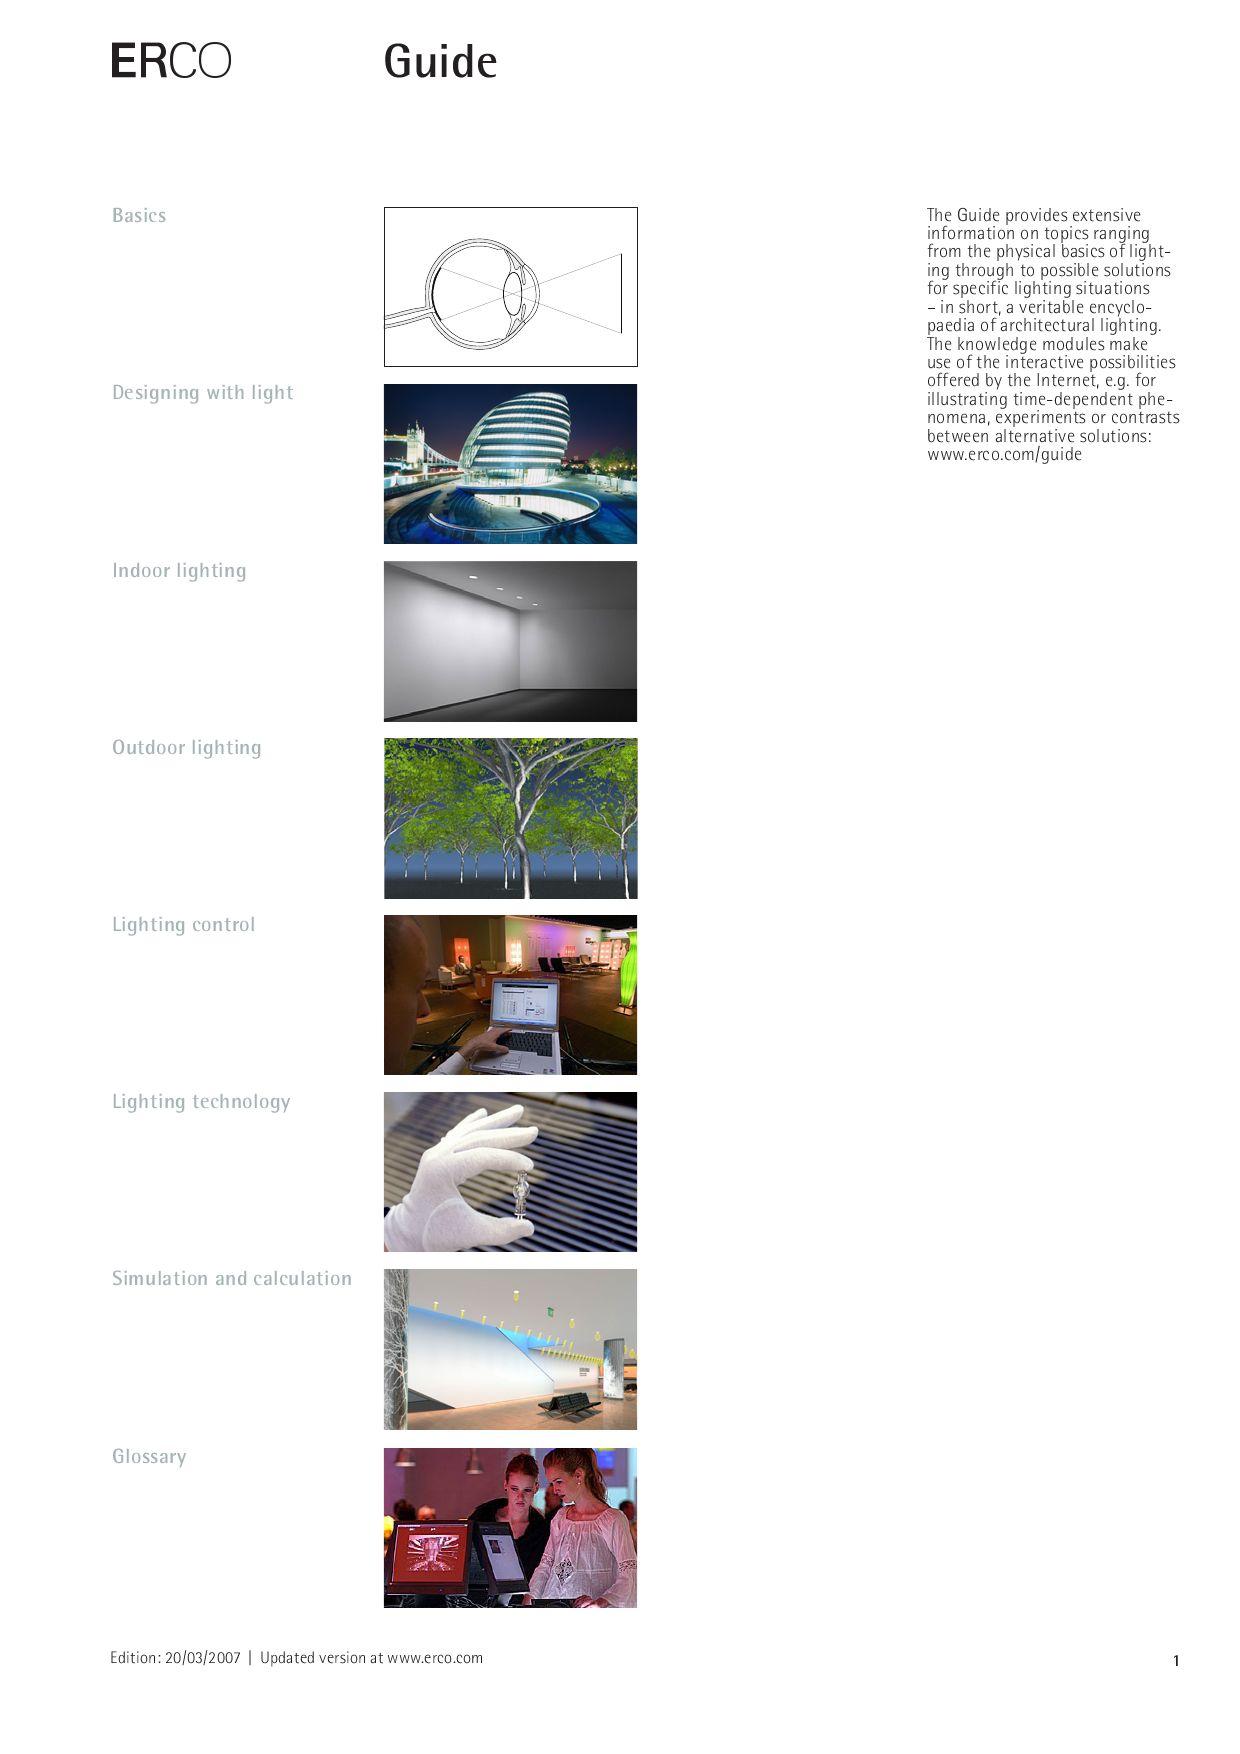 erco lighting guide 2007 by lightonline